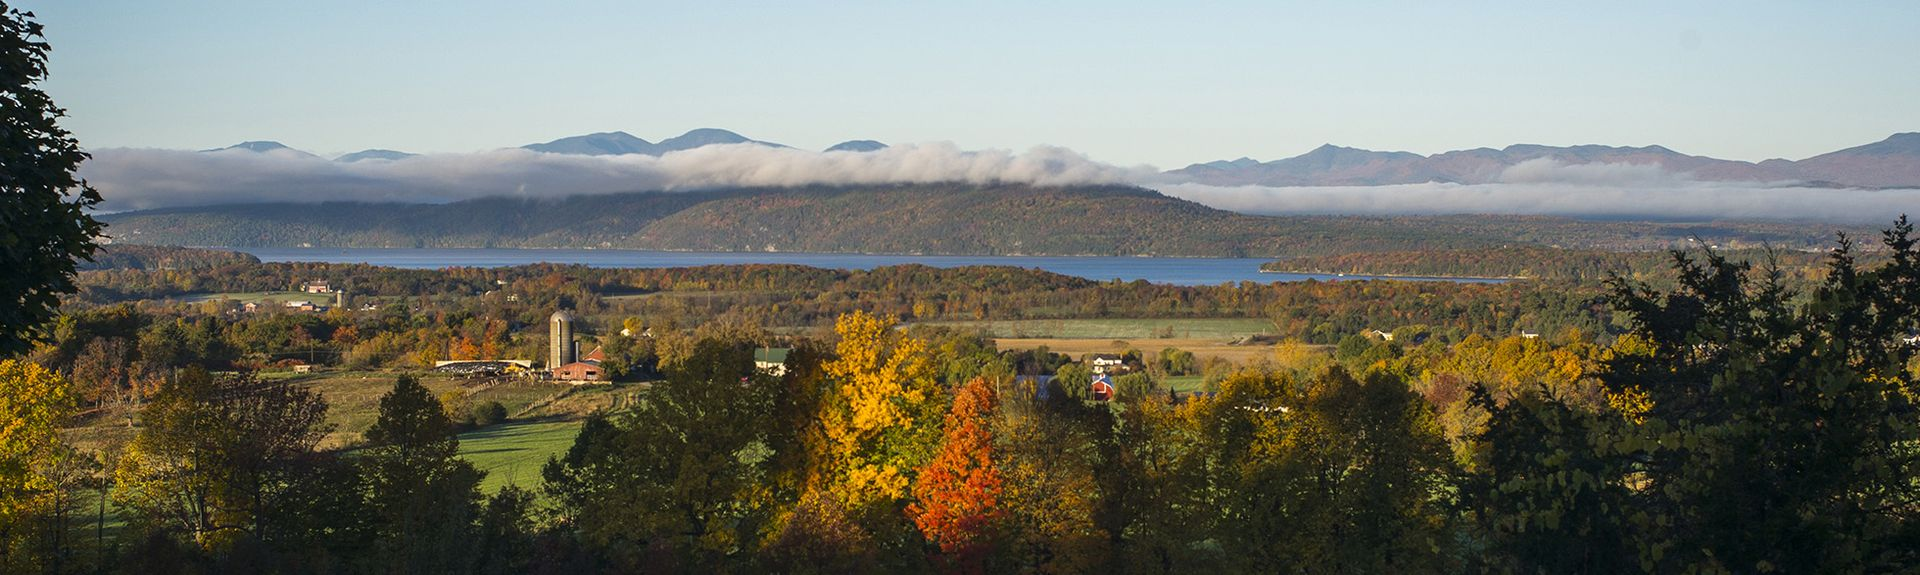 North Ferrisburgh, Ferrisburgh, Vermont, États-Unis